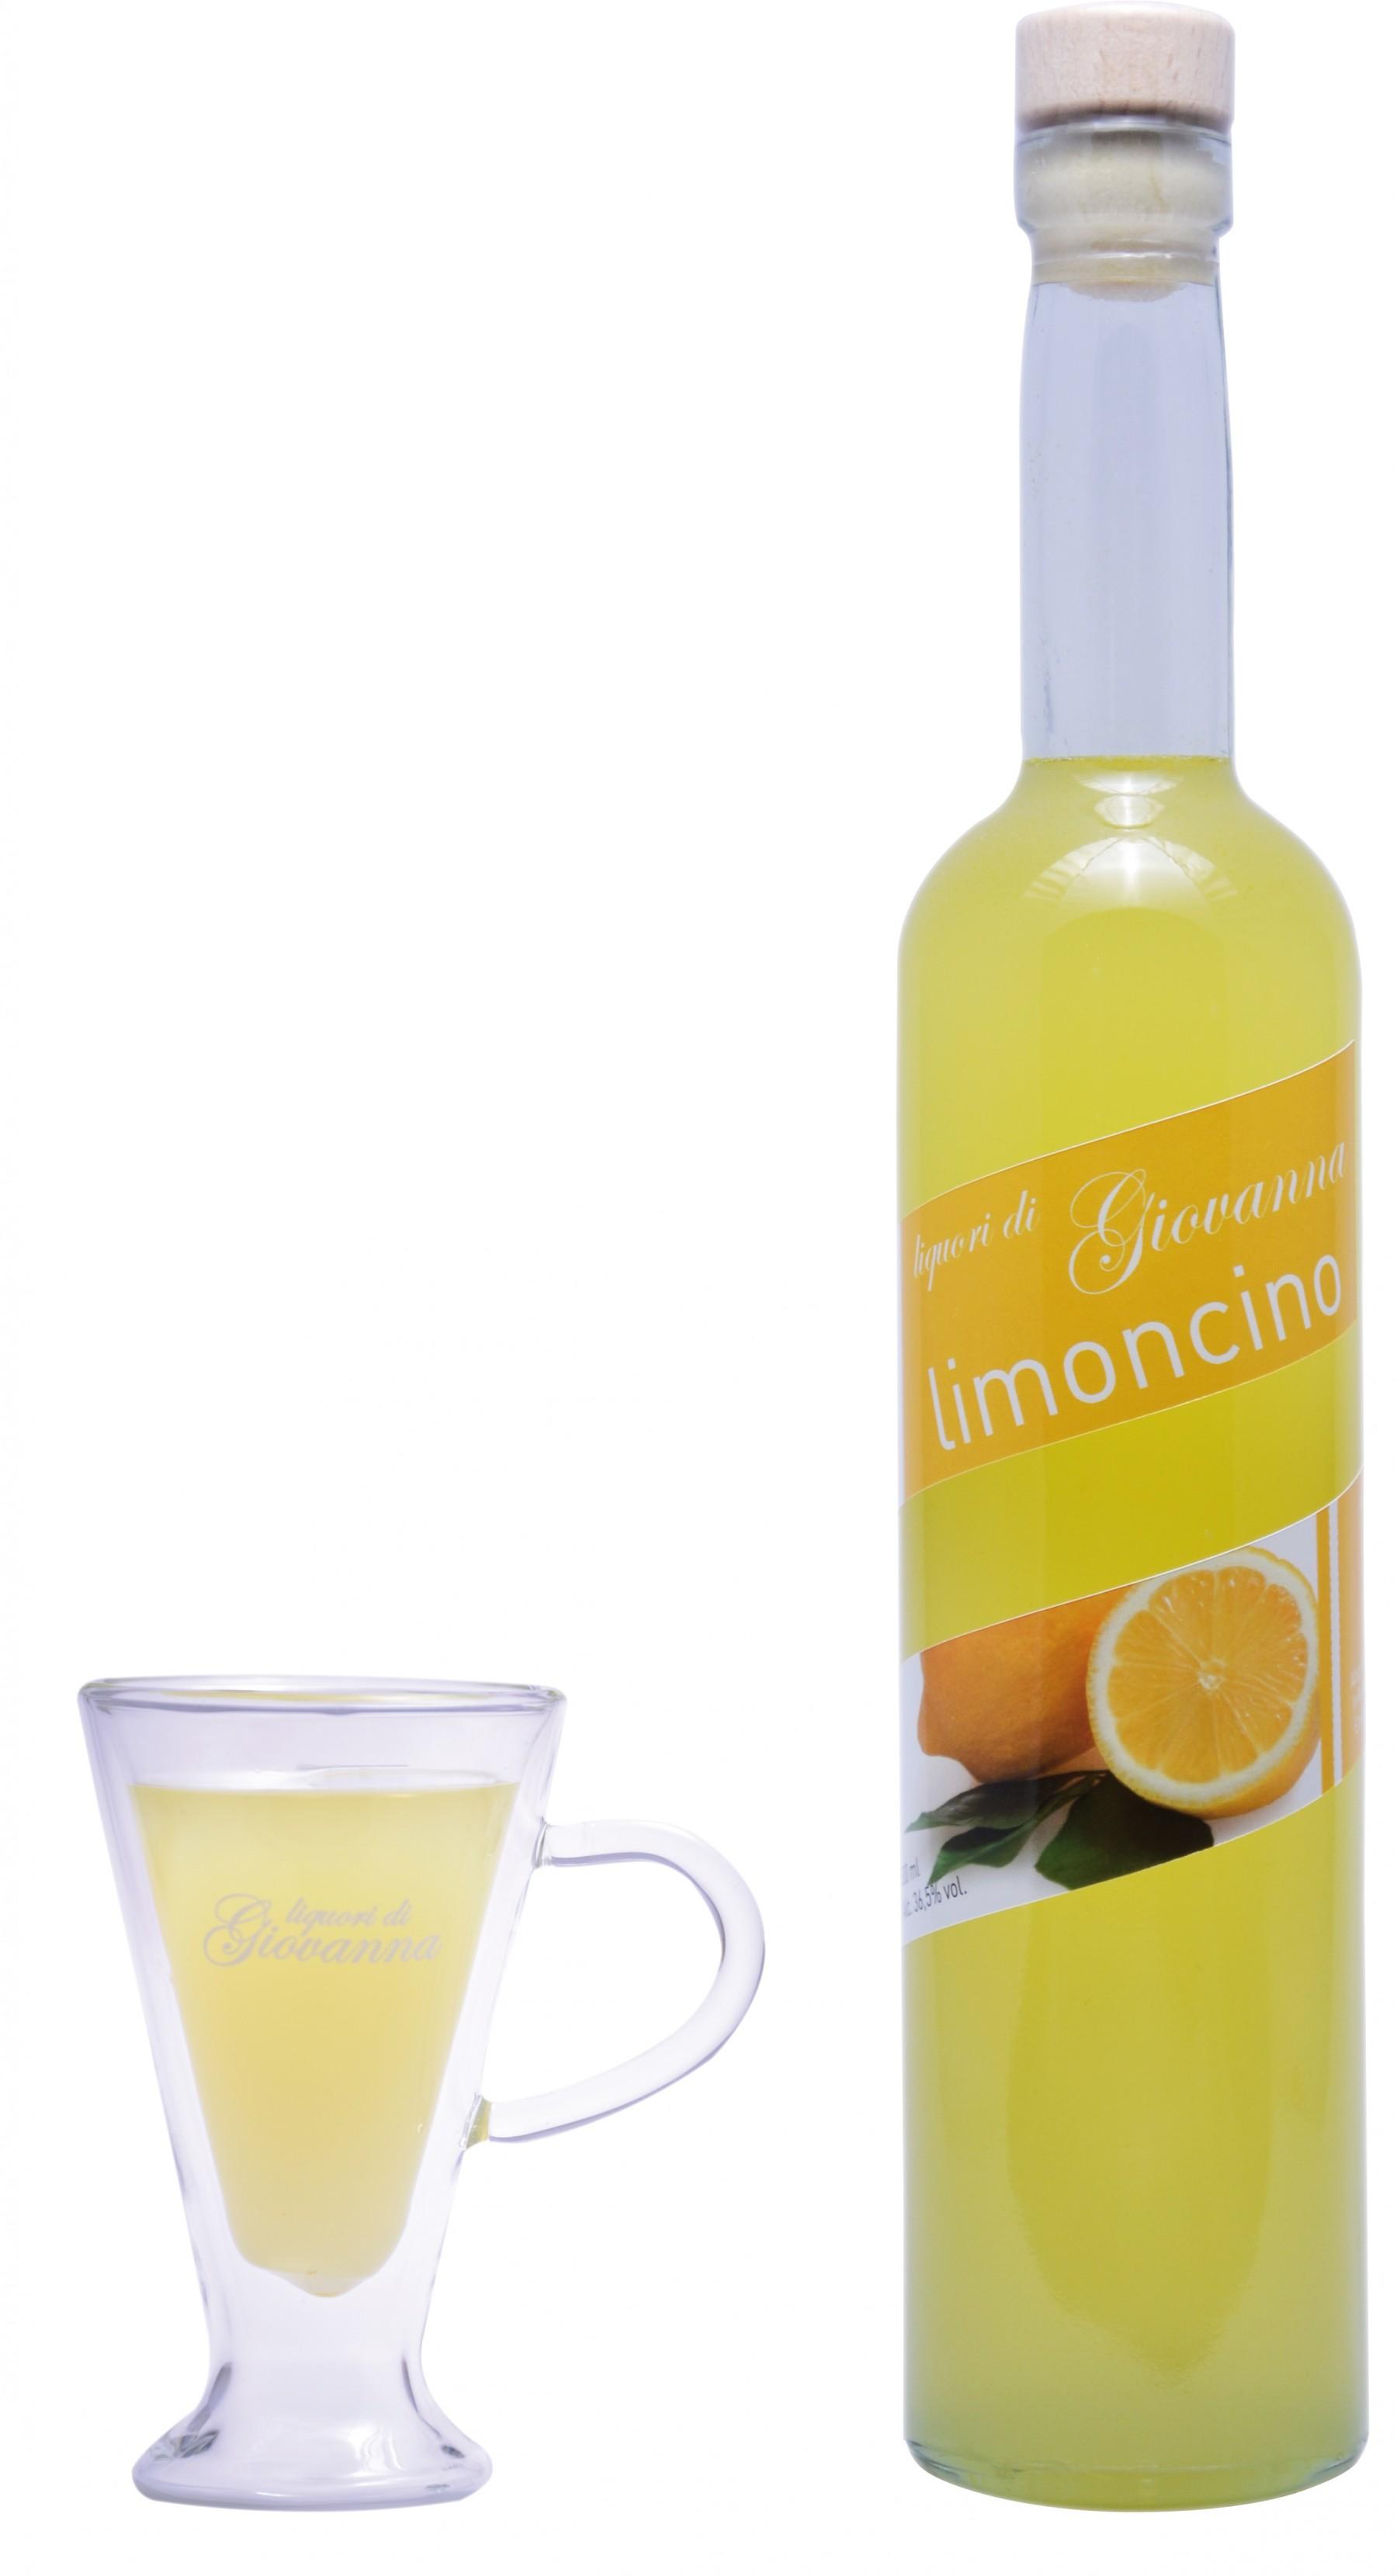 diGiovanna - Limoncino (50 CL)